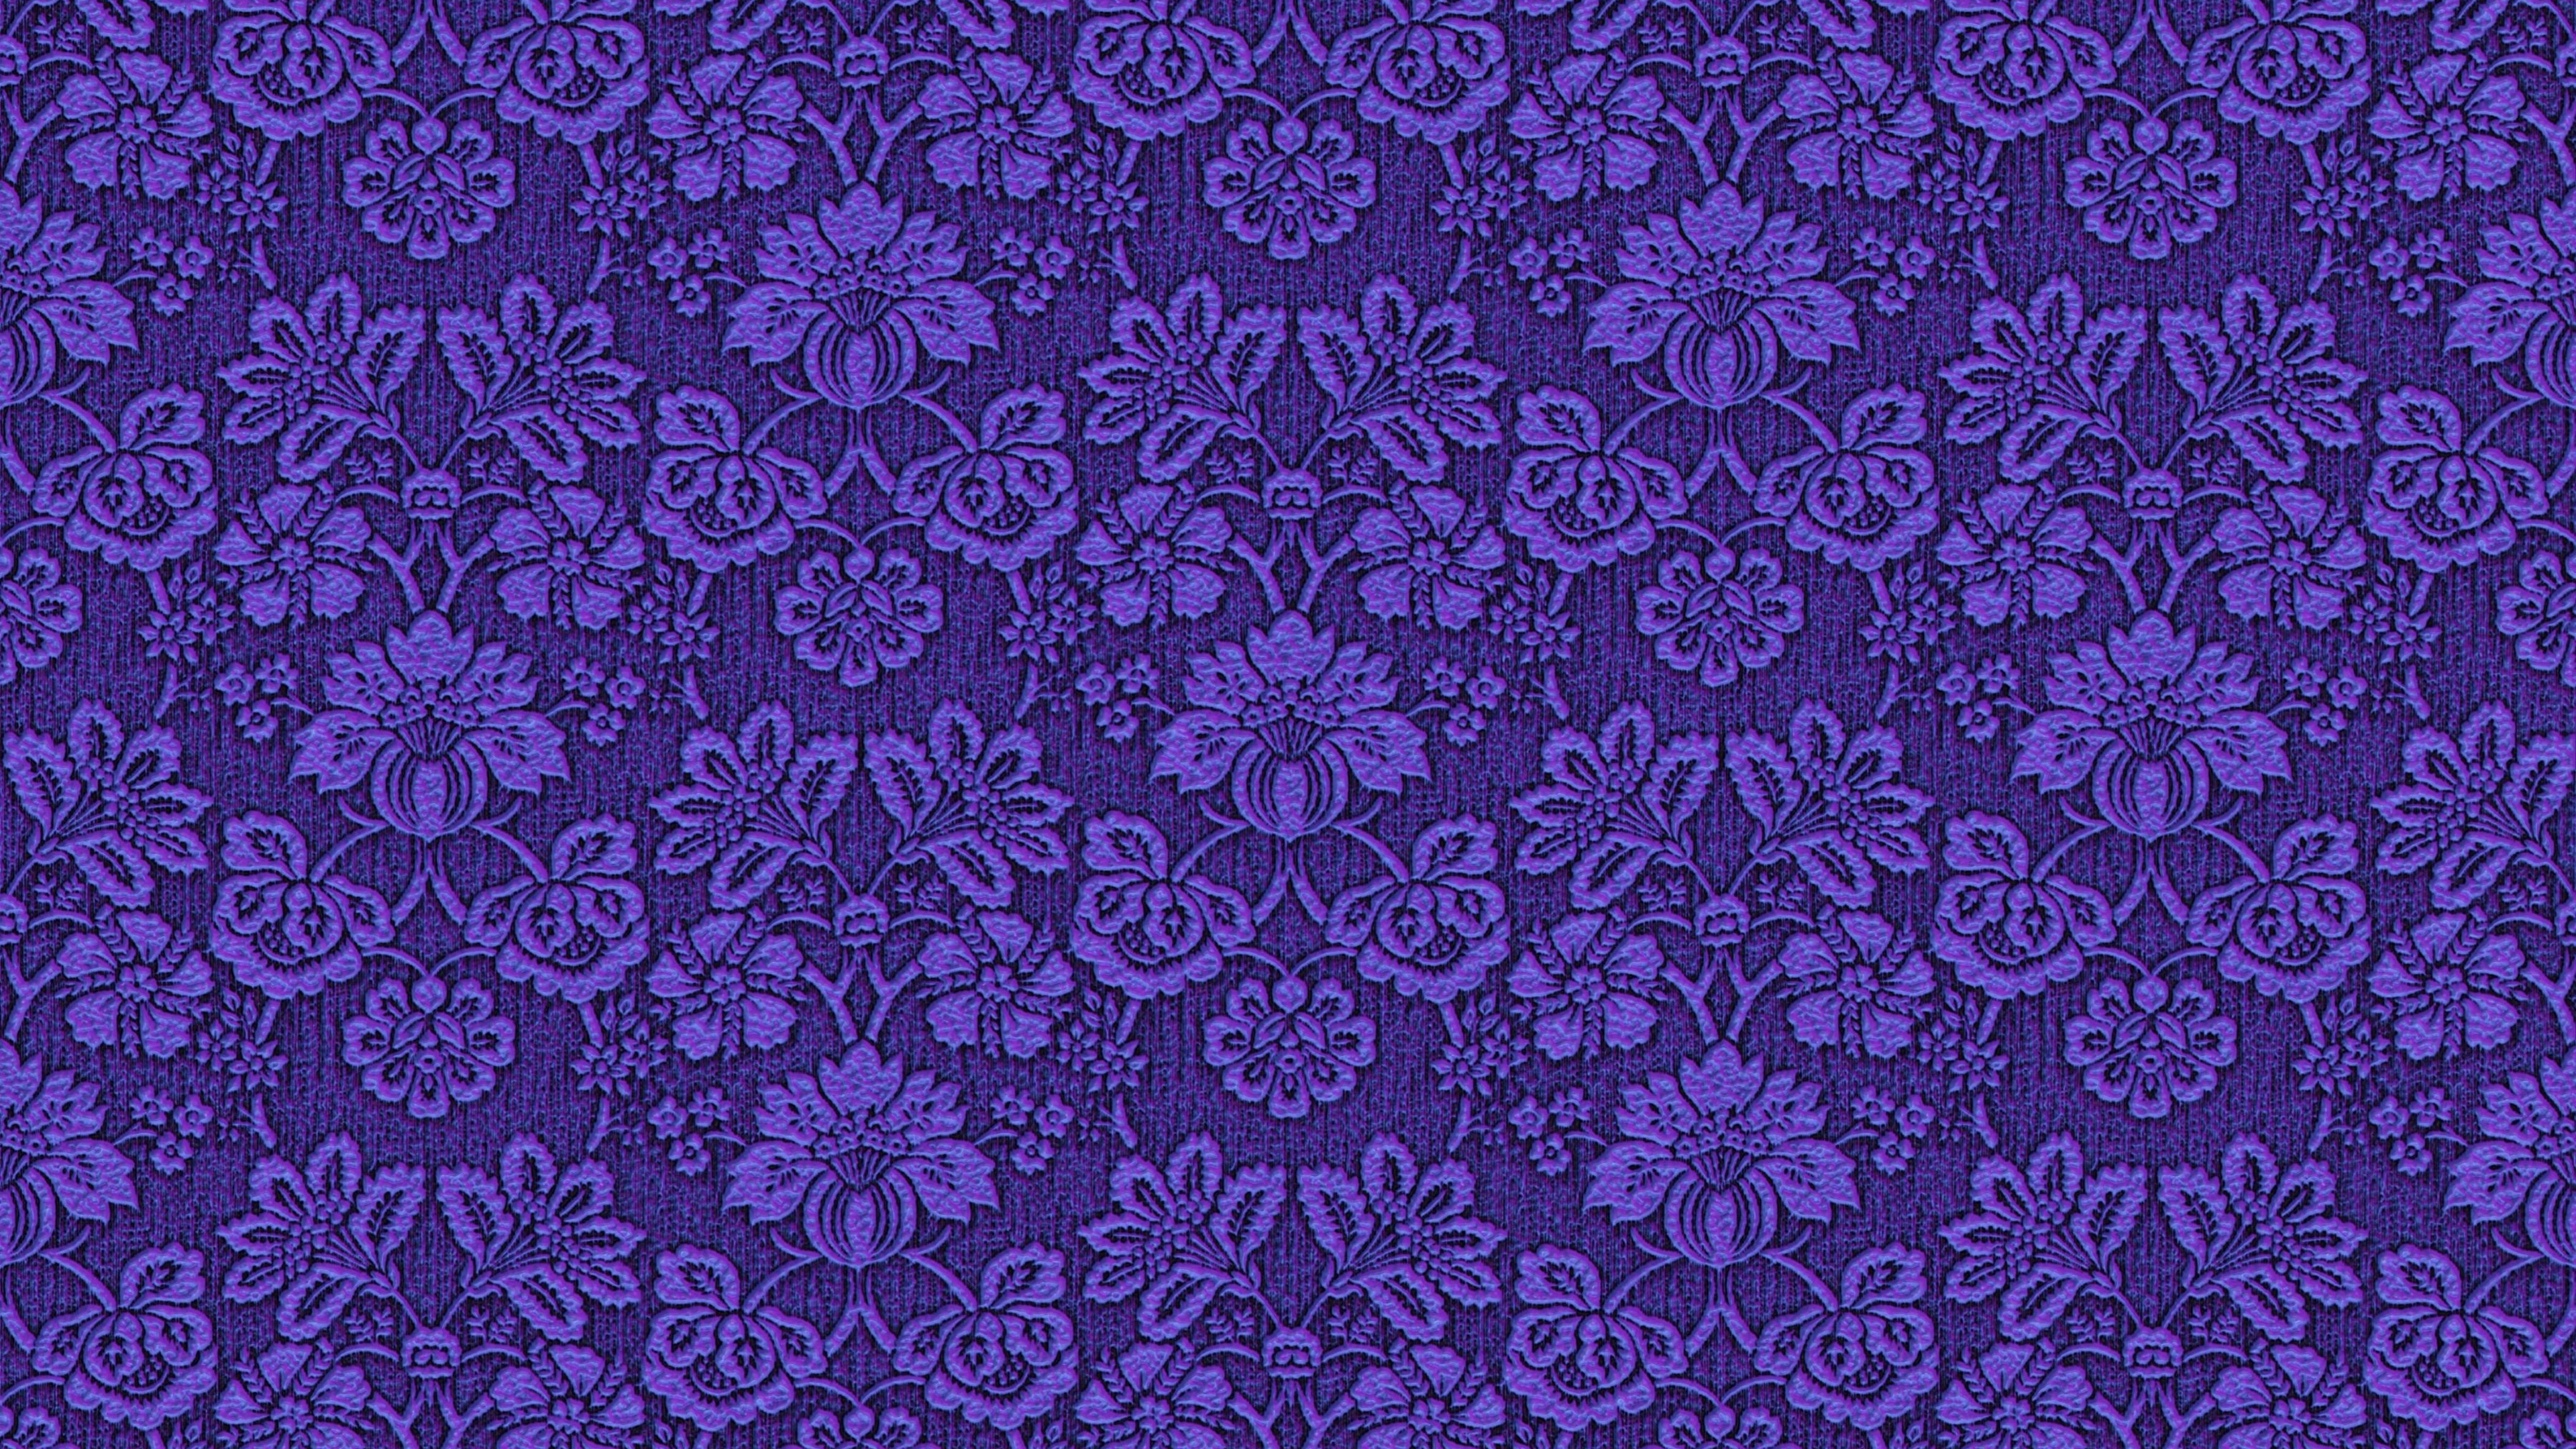 patterns fabric purple ornament 4k 1536097804 - patterns, fabric, purple, ornament 4k - Purple, patterns, Fabric